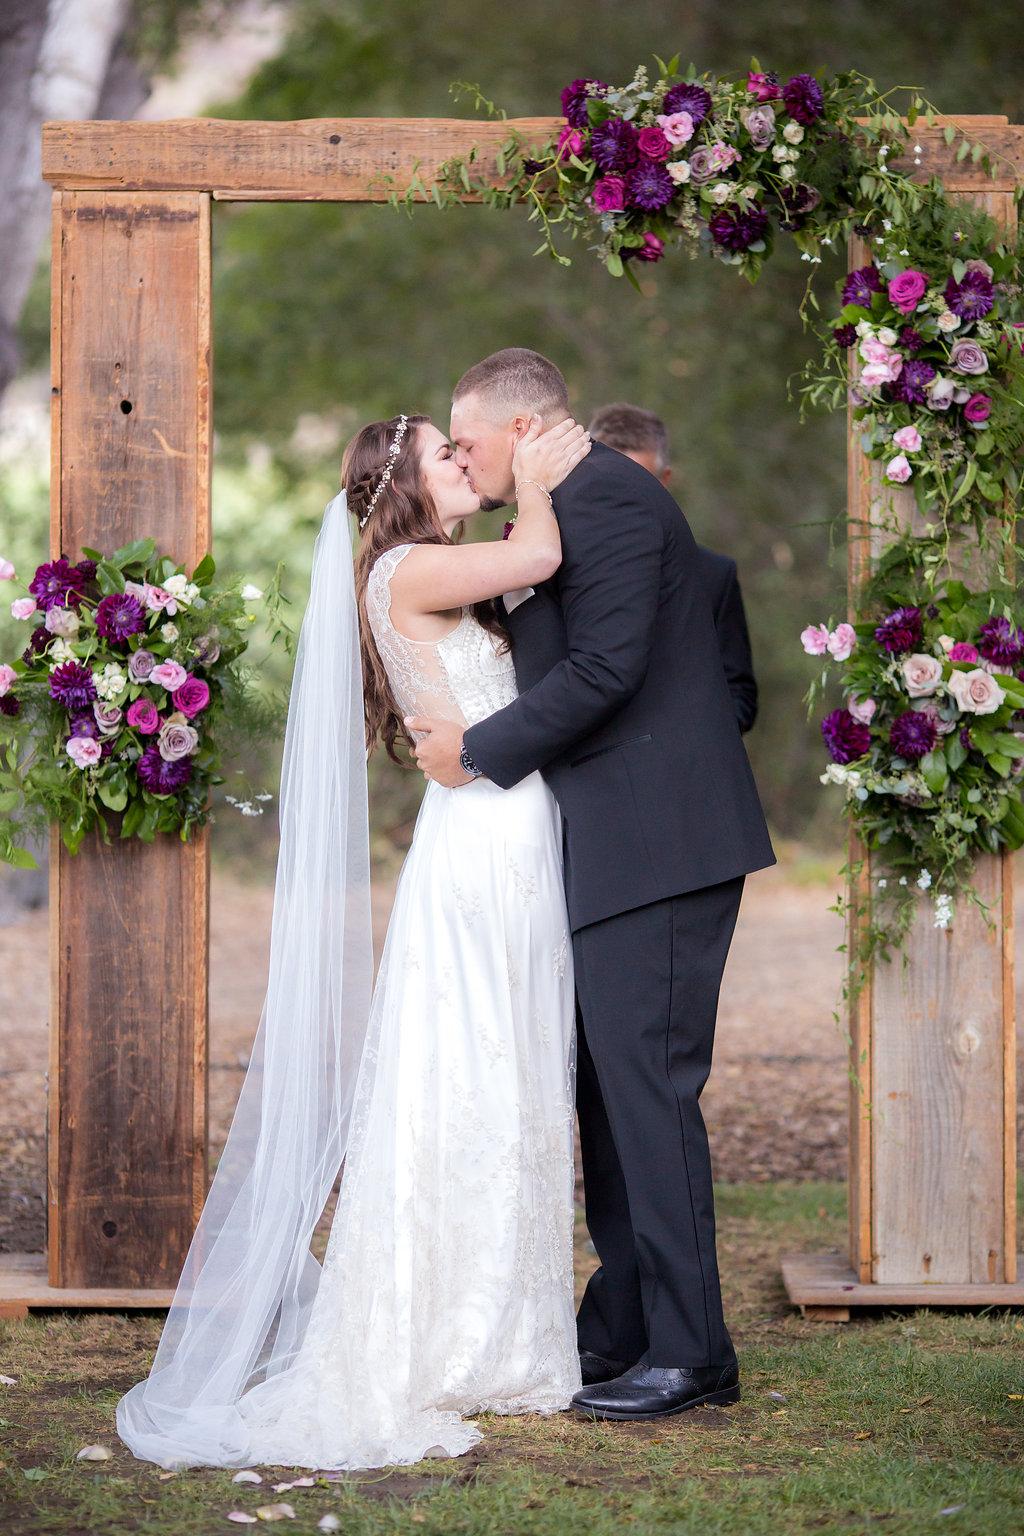 Honey Photographs by Alyss | Michelle Garibay Events | Temecula Creek Inn Wedding